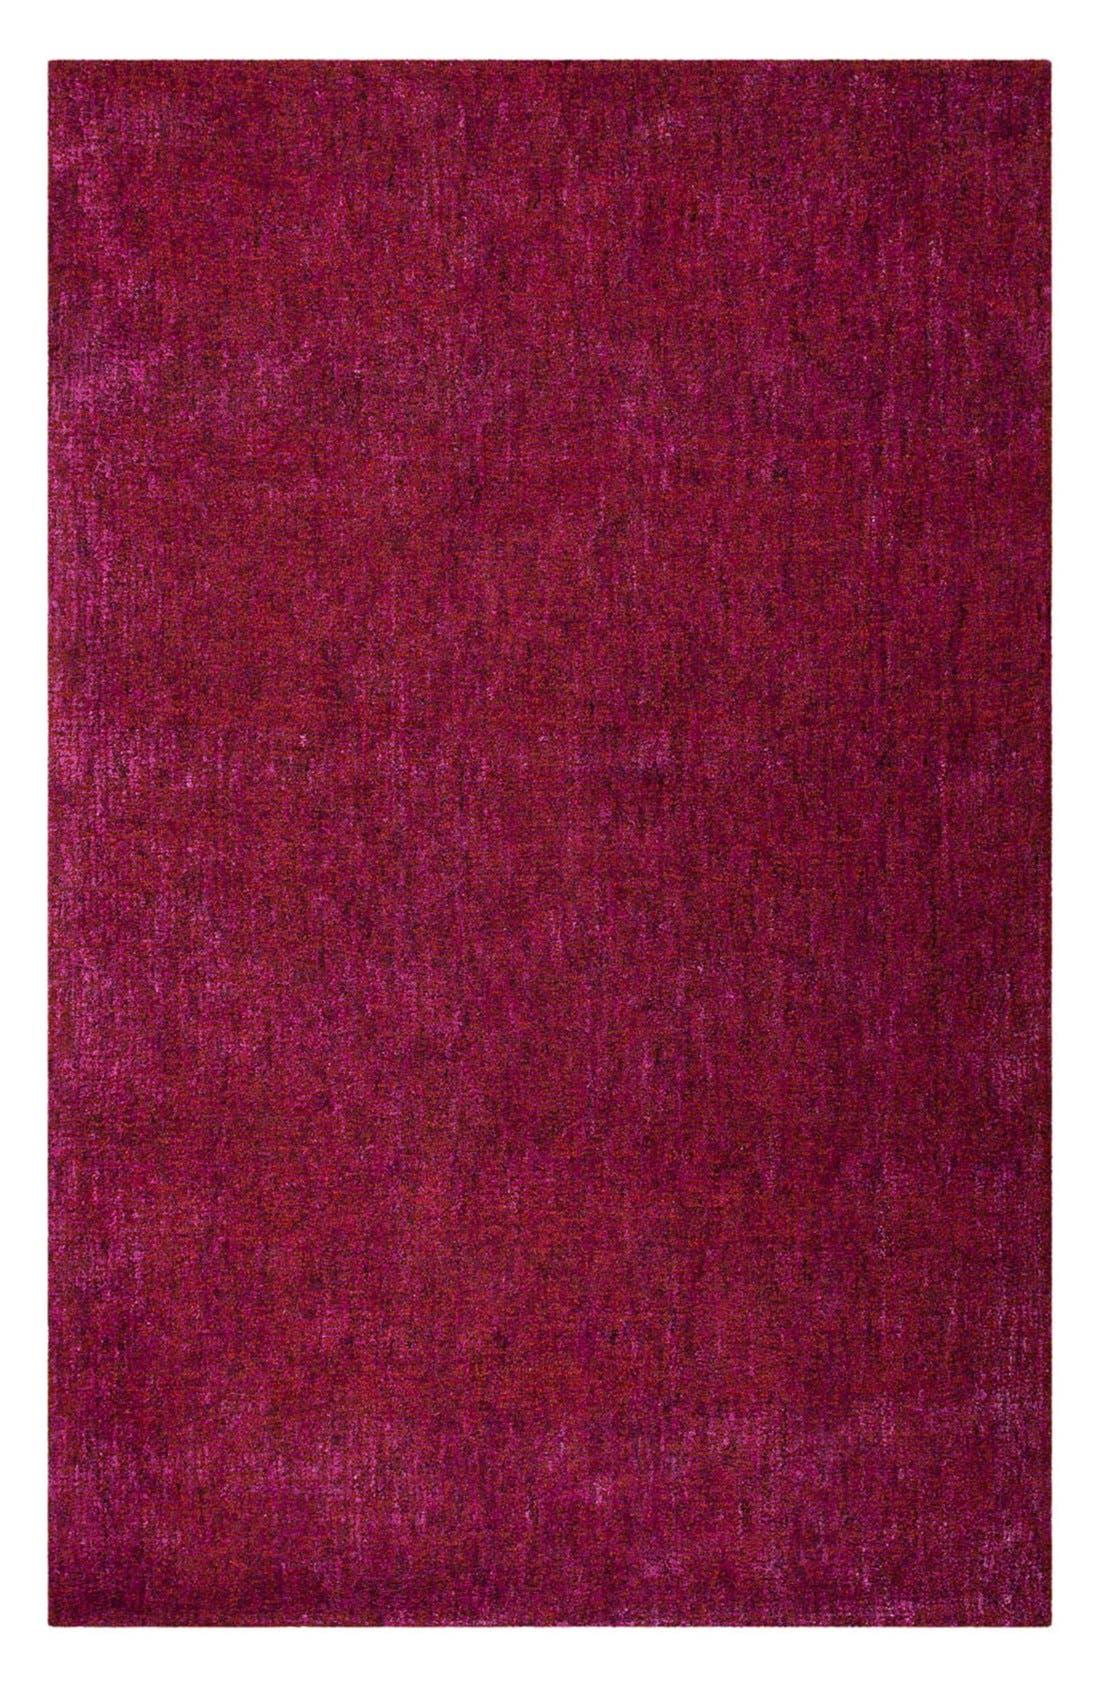 Main Image - kate spade new york 'stuyvesant' rug